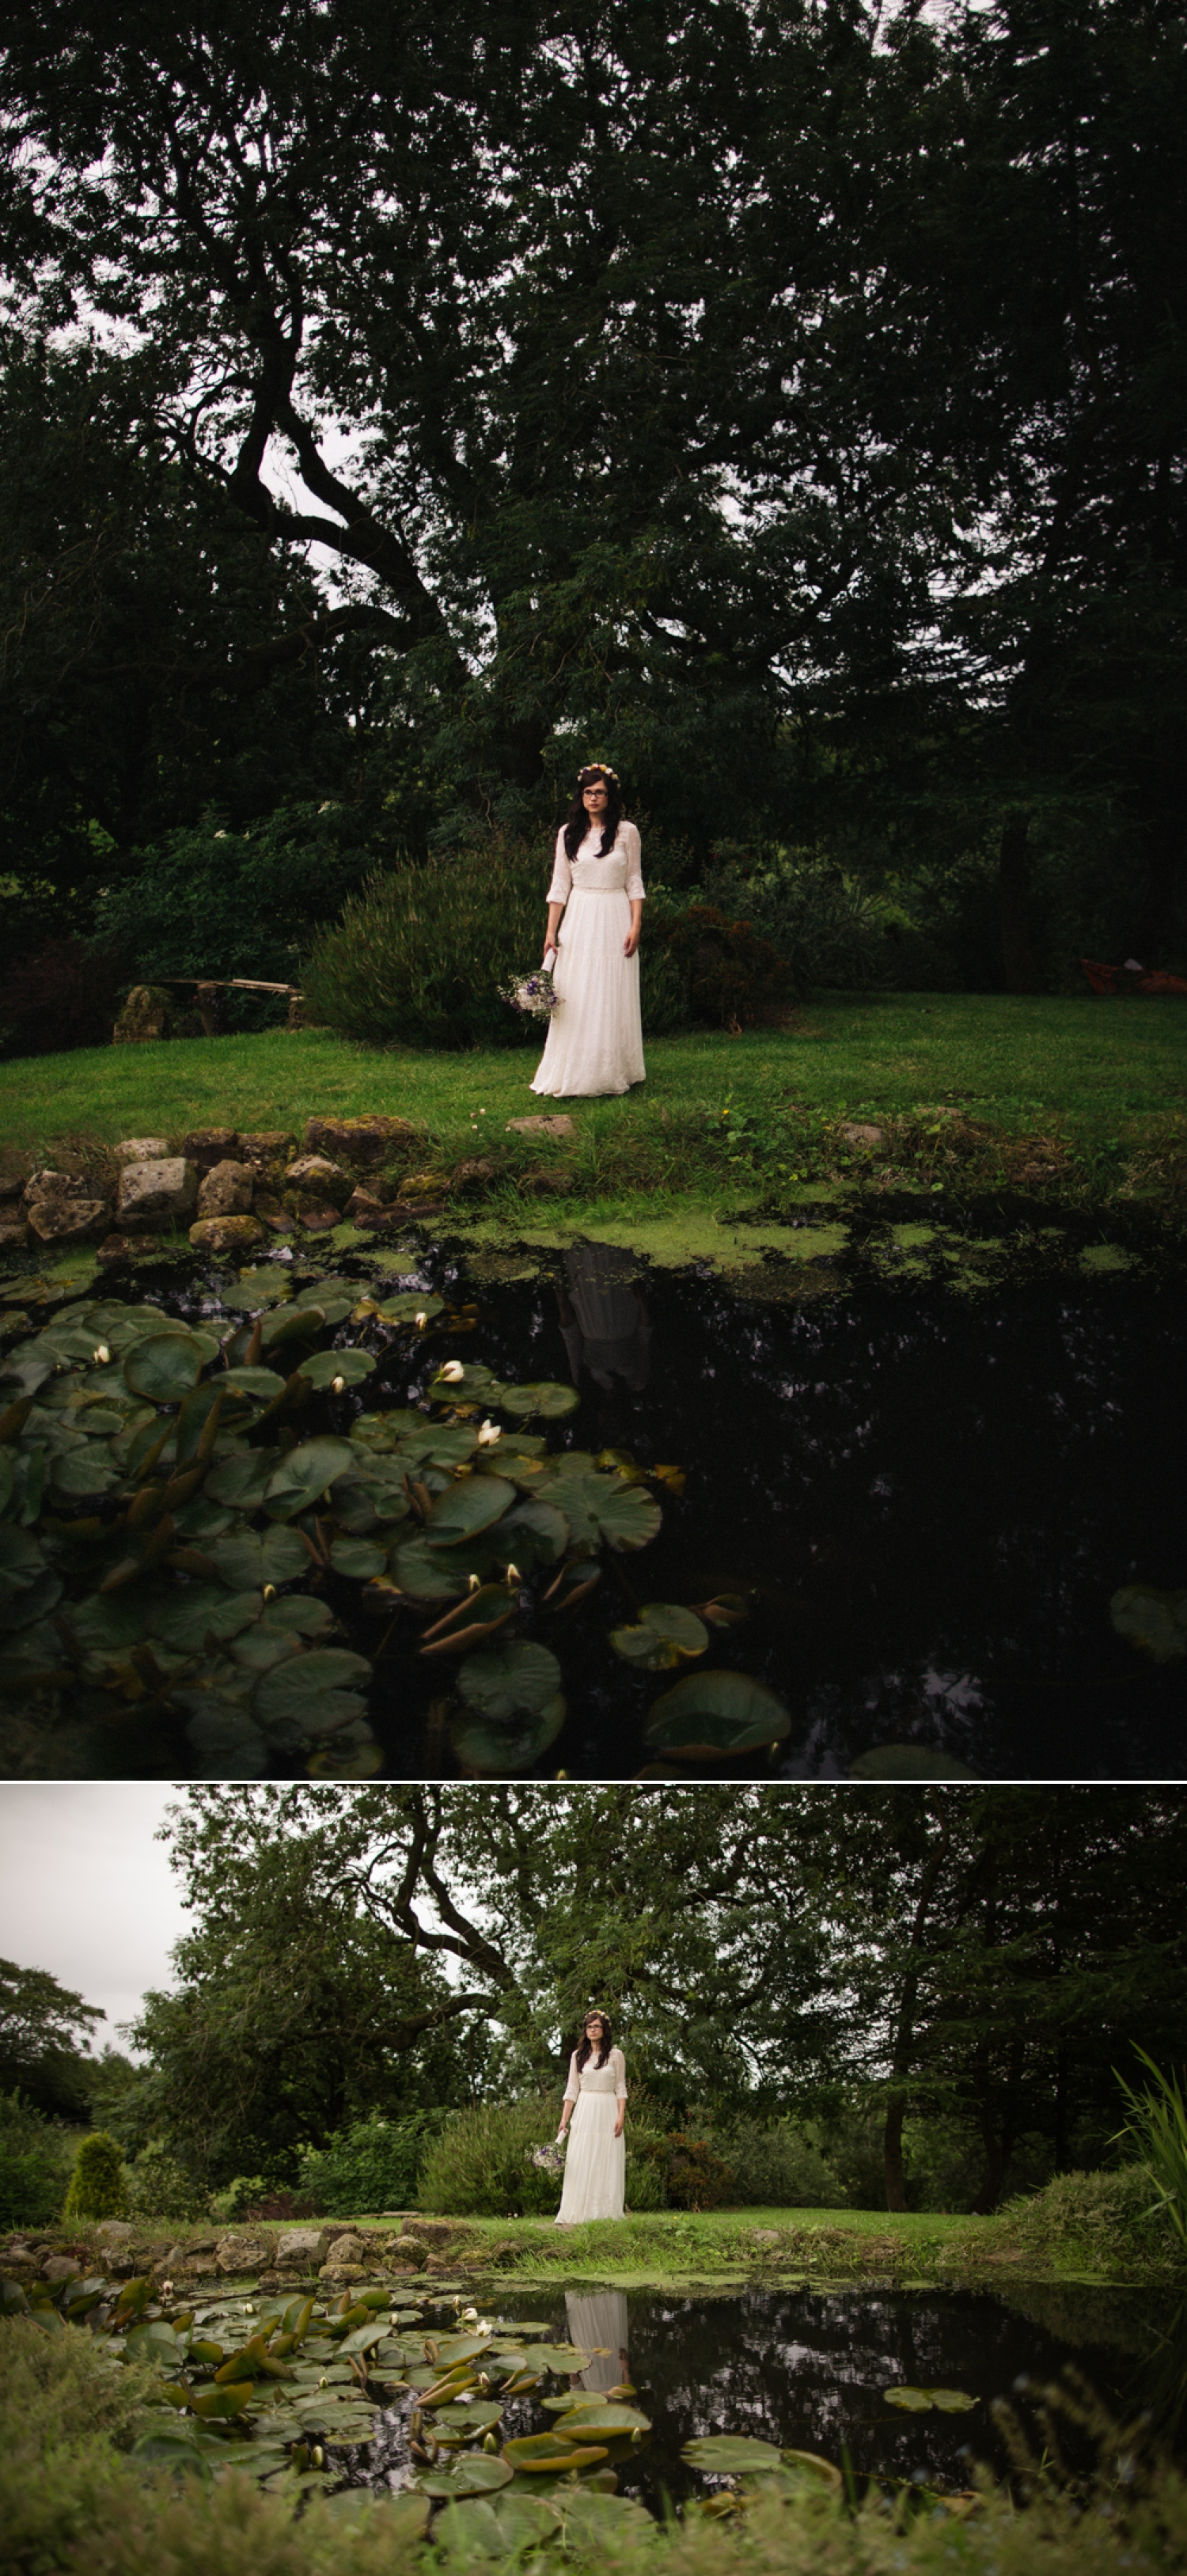 Somerset Wedding Photographer Elly & Liam 10